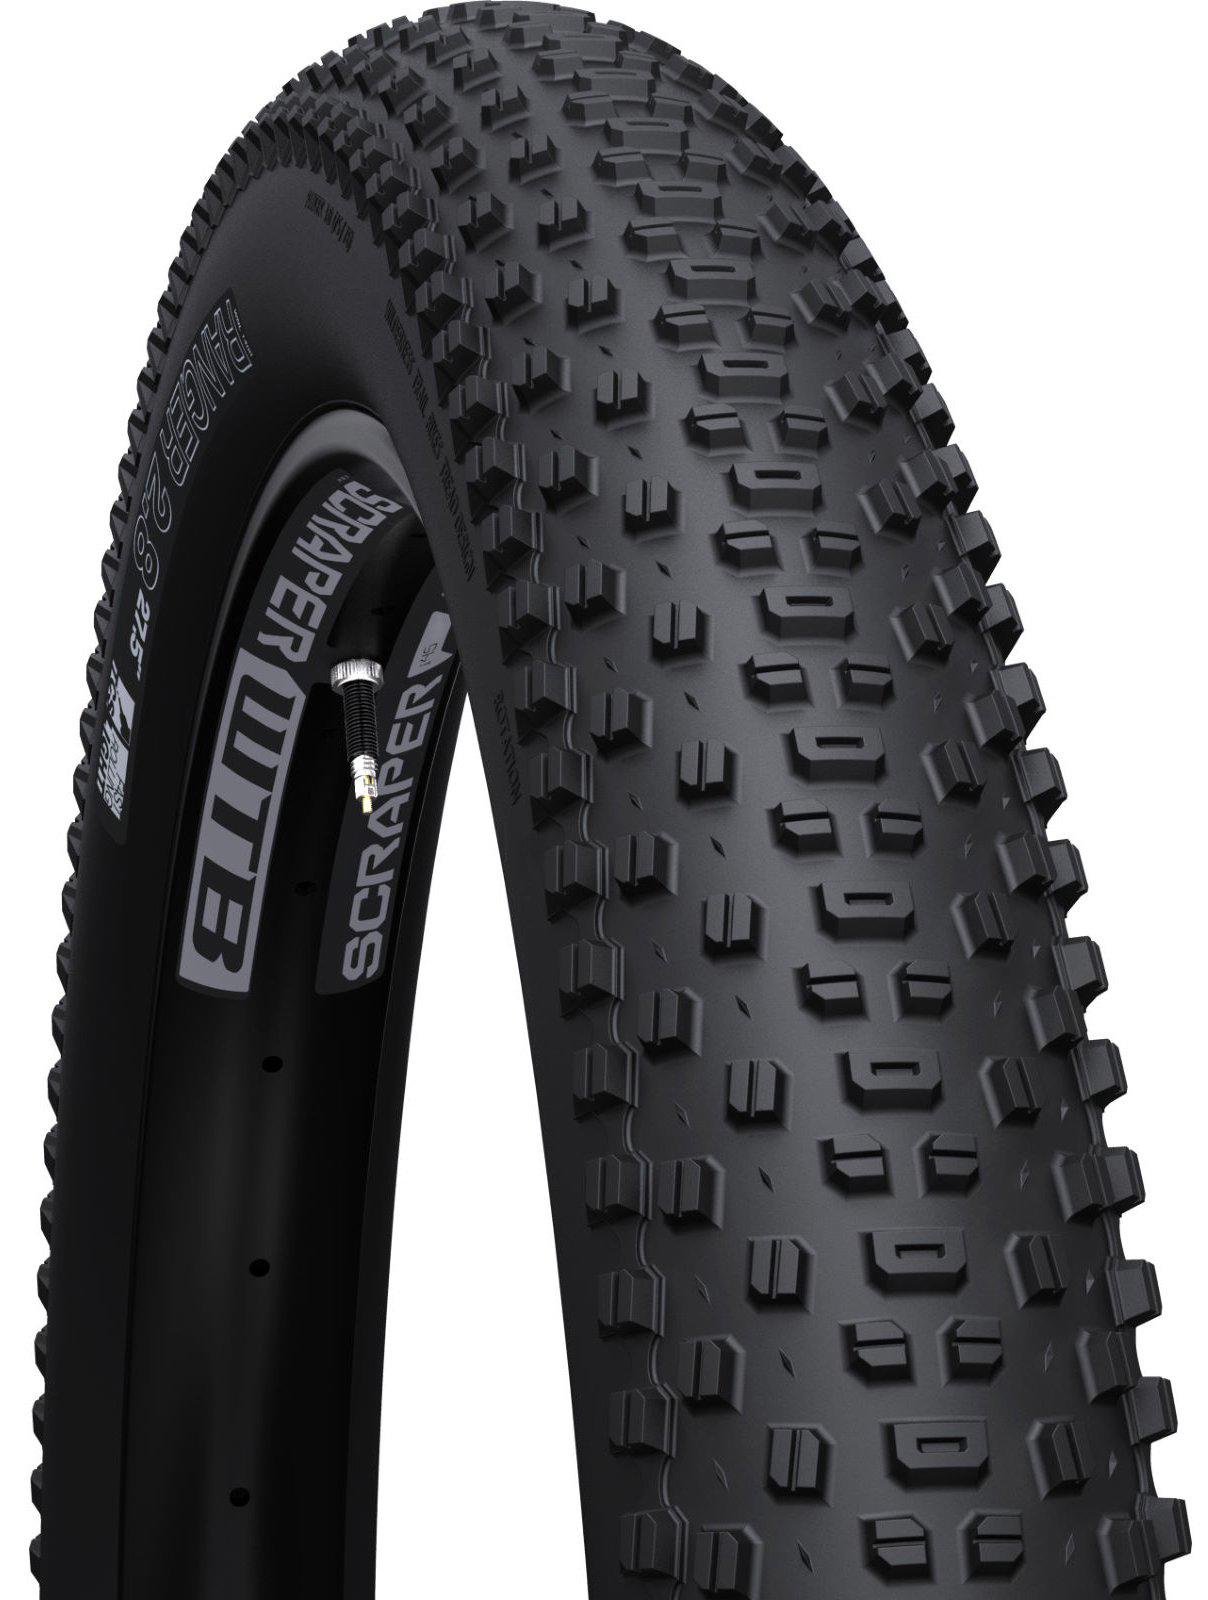 WTB Ranger 27.5X2.8 Tcs Light Tire